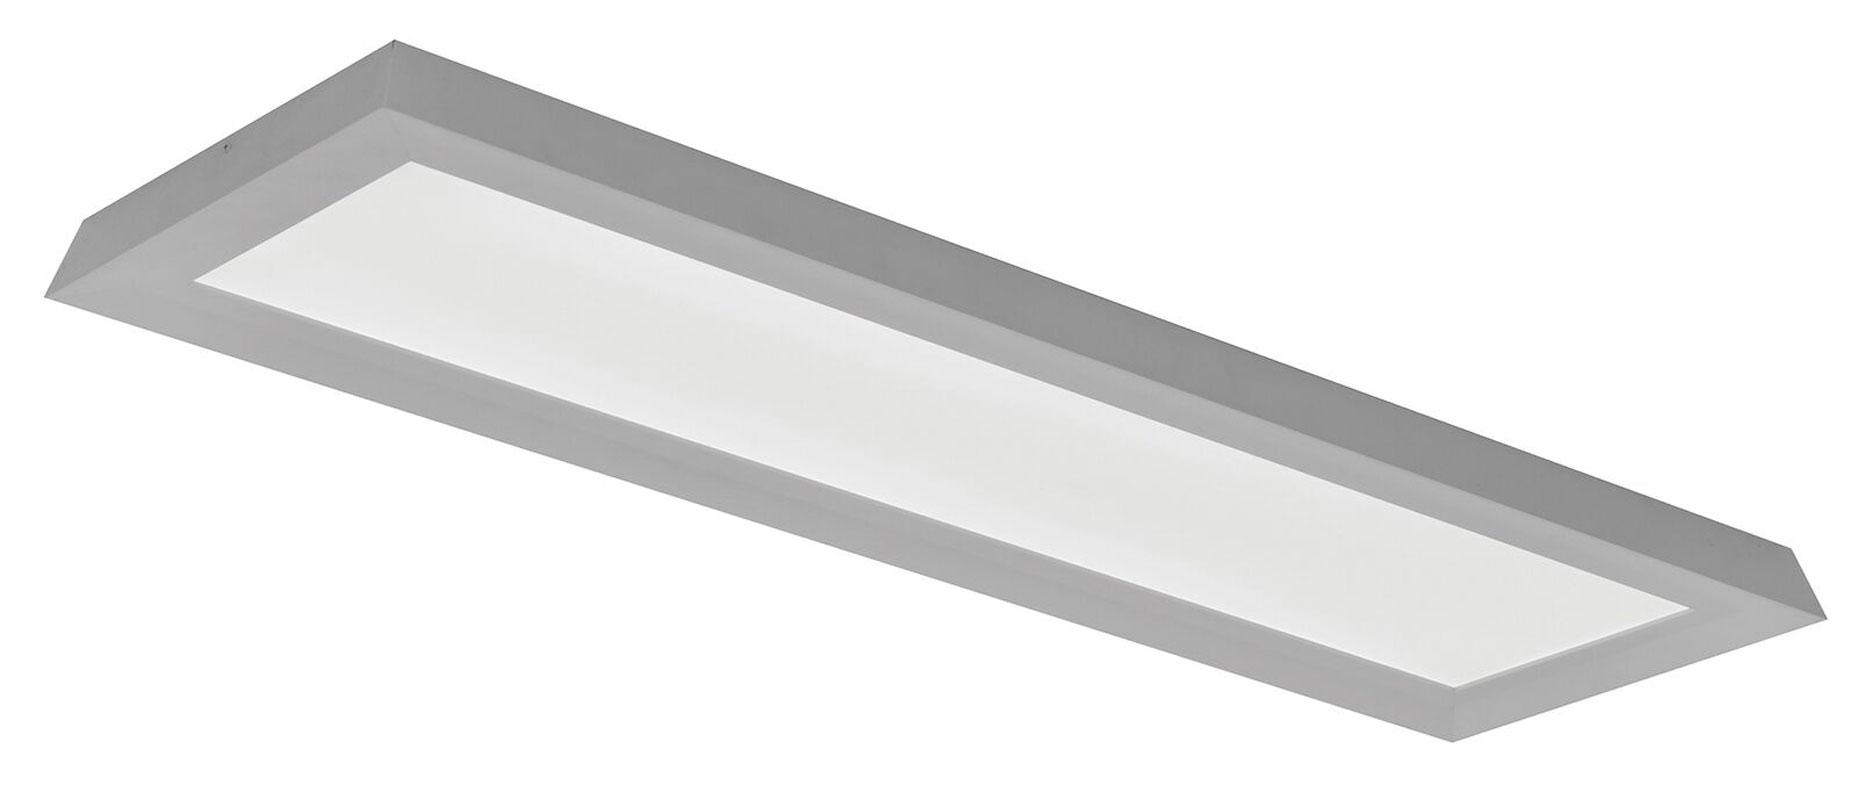 zurich linear flush mount ceiling light by afx zuf12241800l30d1sn